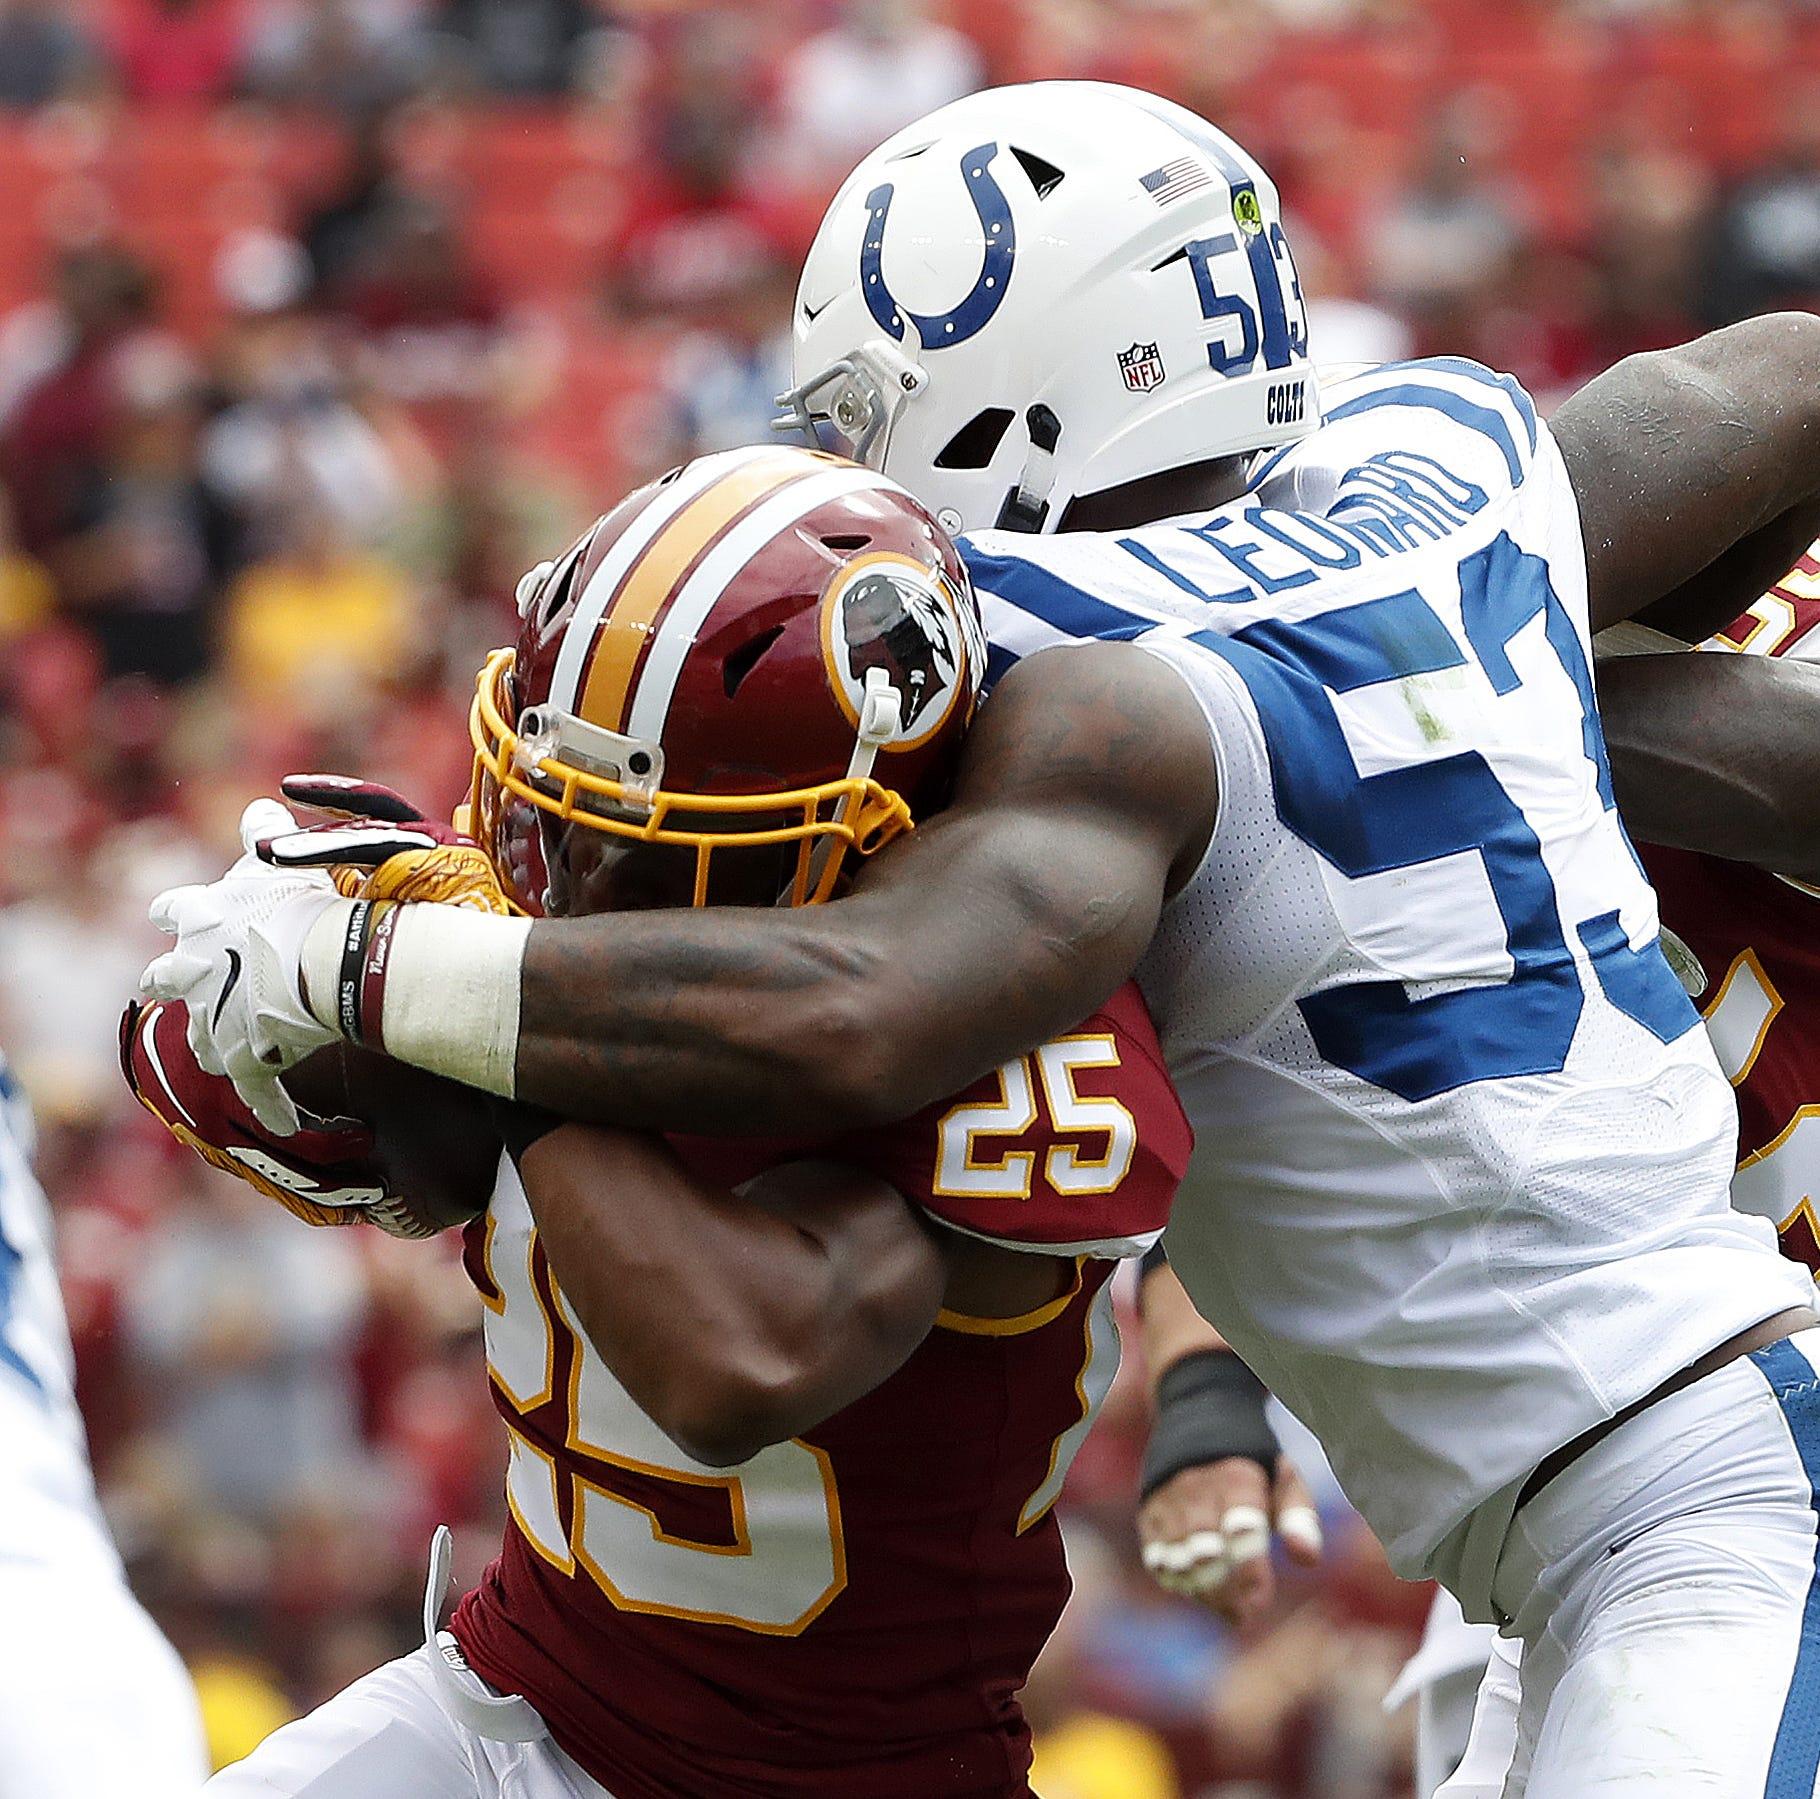 Colts rookie linebacker Darius Leonard named AFC Defensive Player of the Week